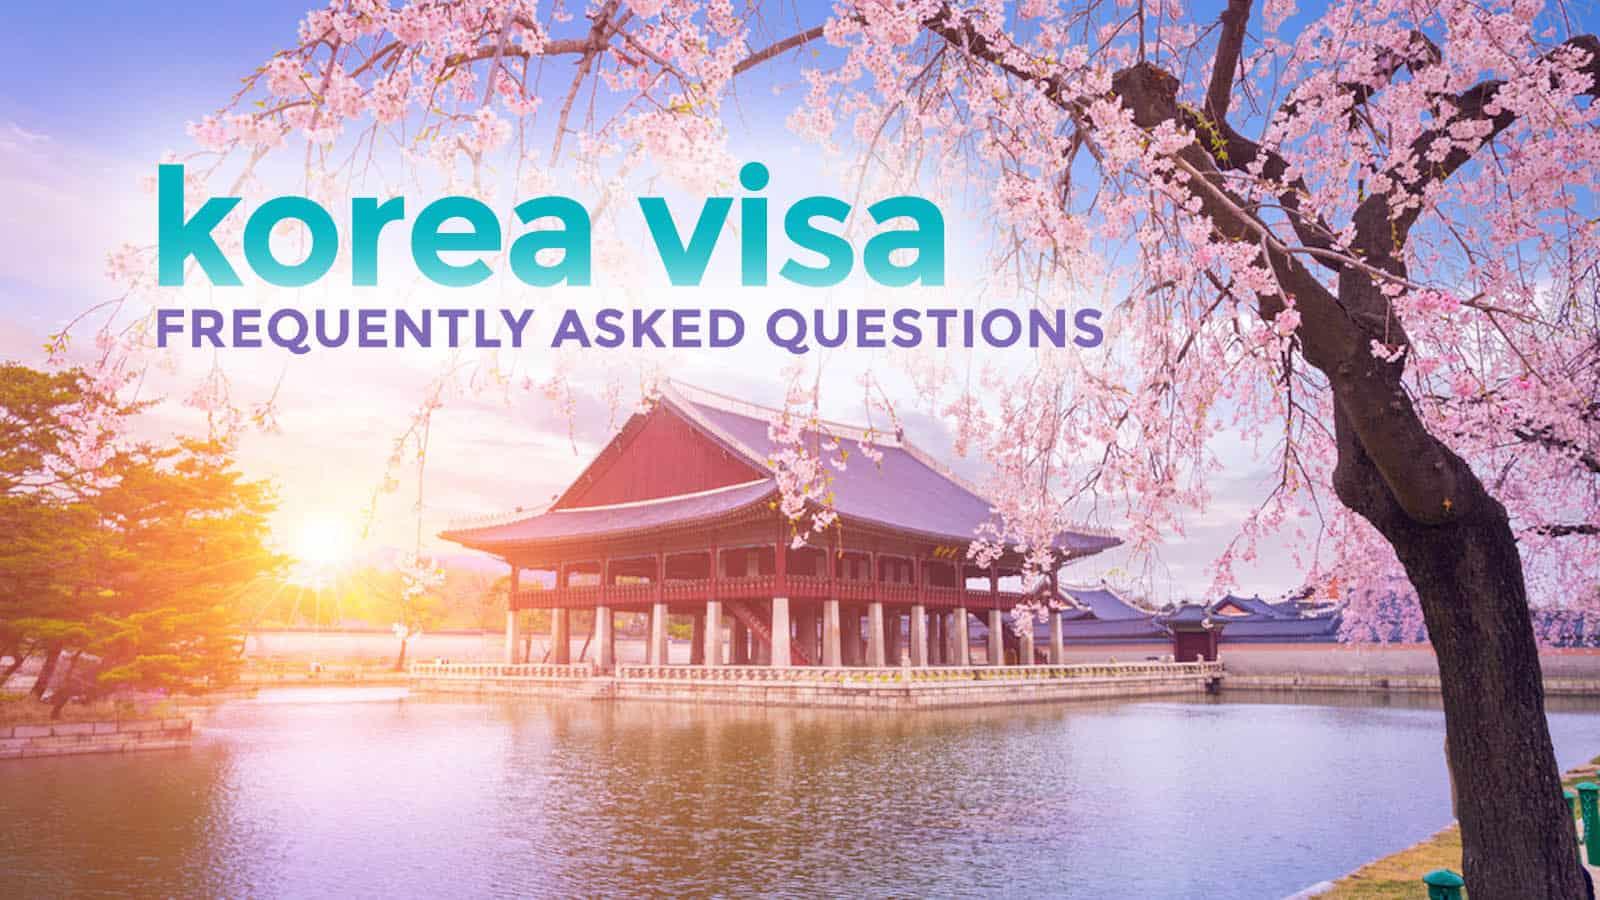 korea visa application new zealand